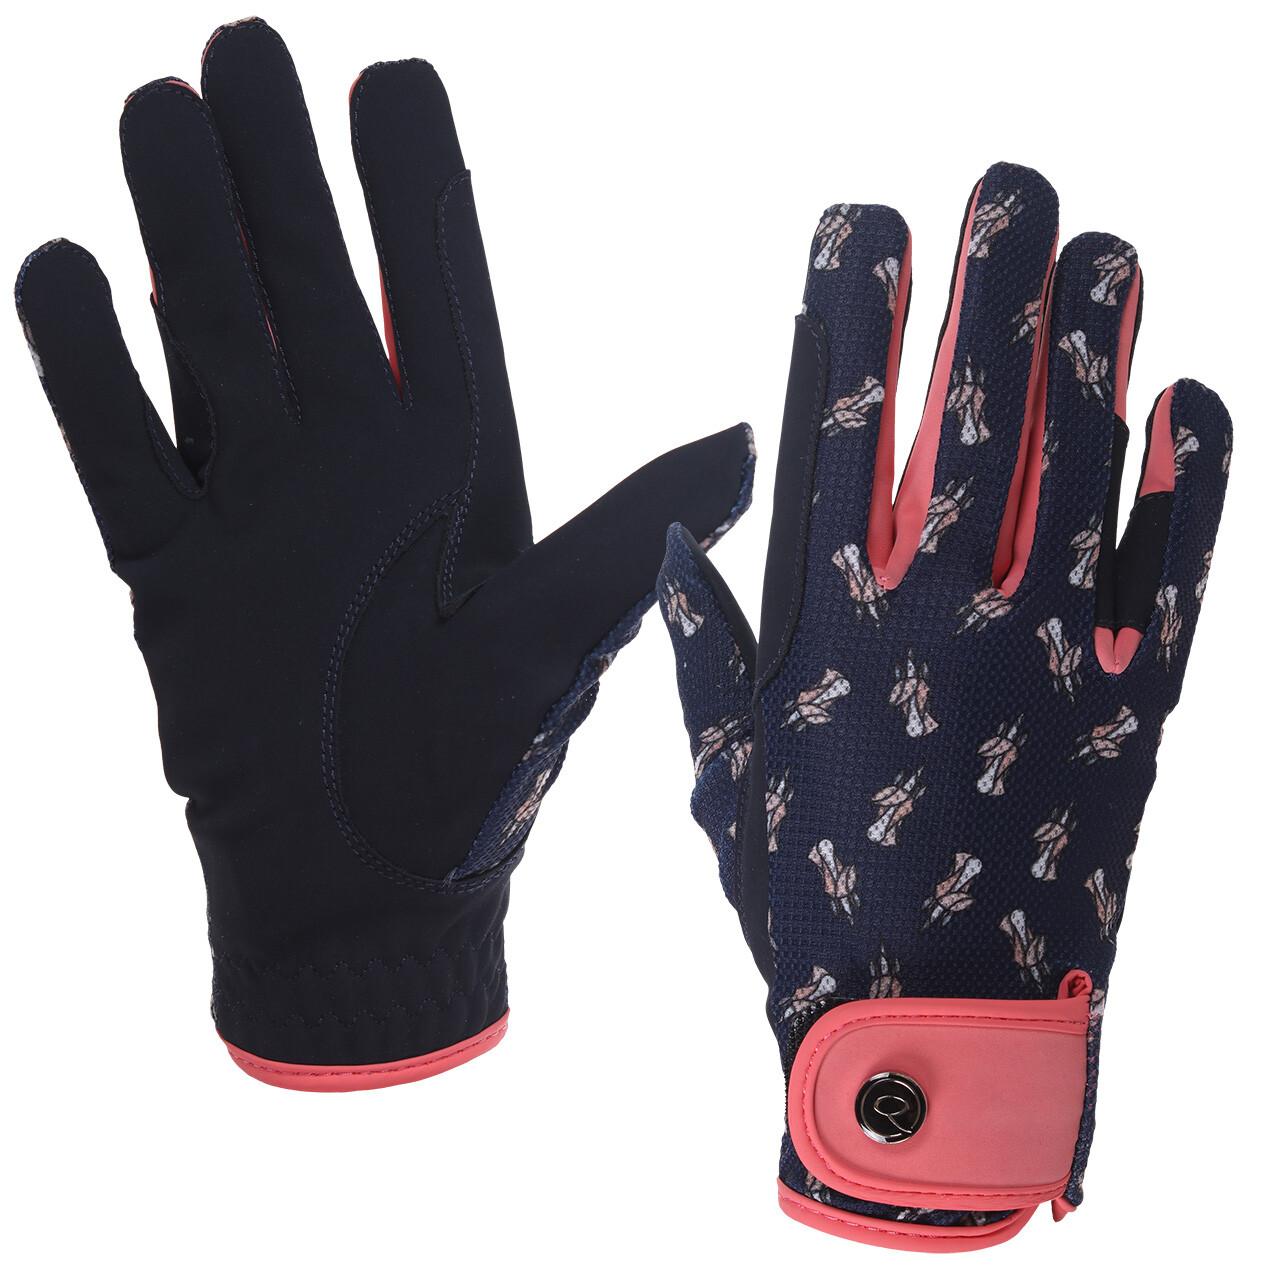 Kinder Reit-Handschuh Sanna Mesh